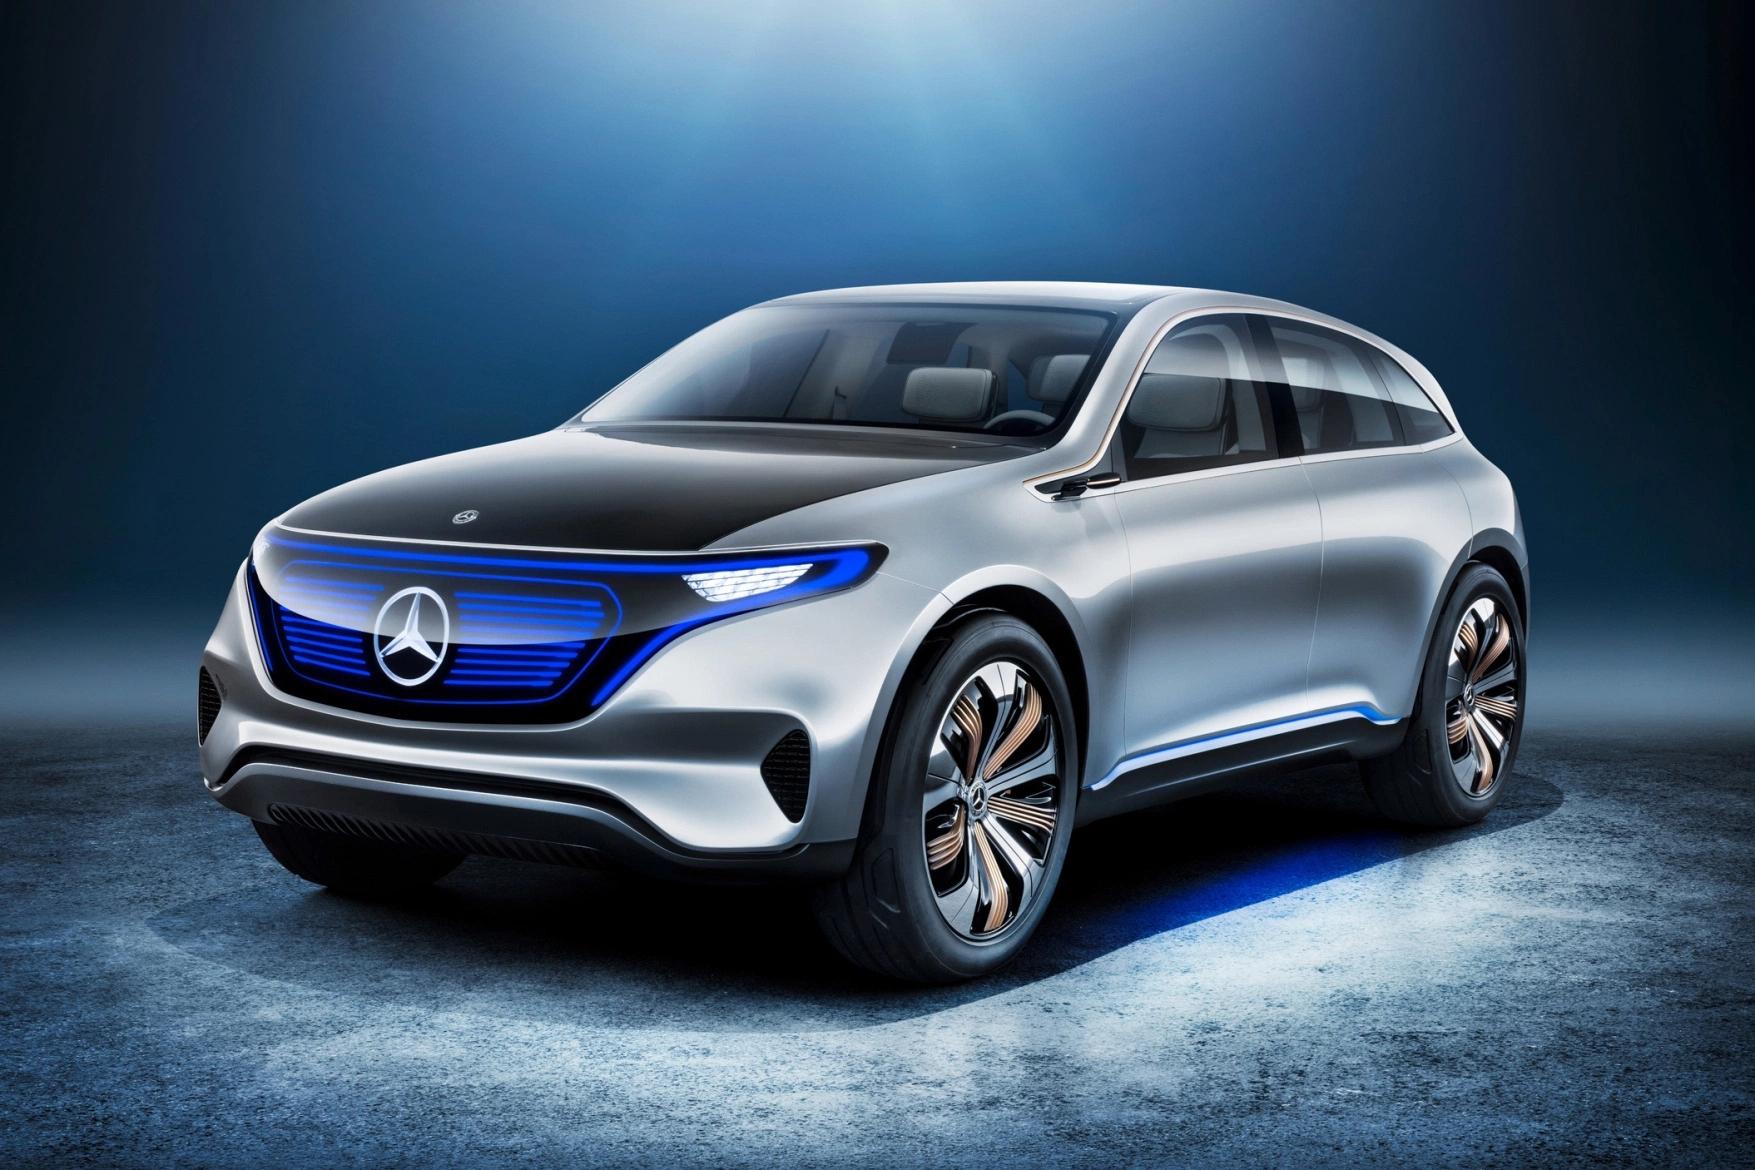 奔驰Generation EQ电动 SUV 概念车